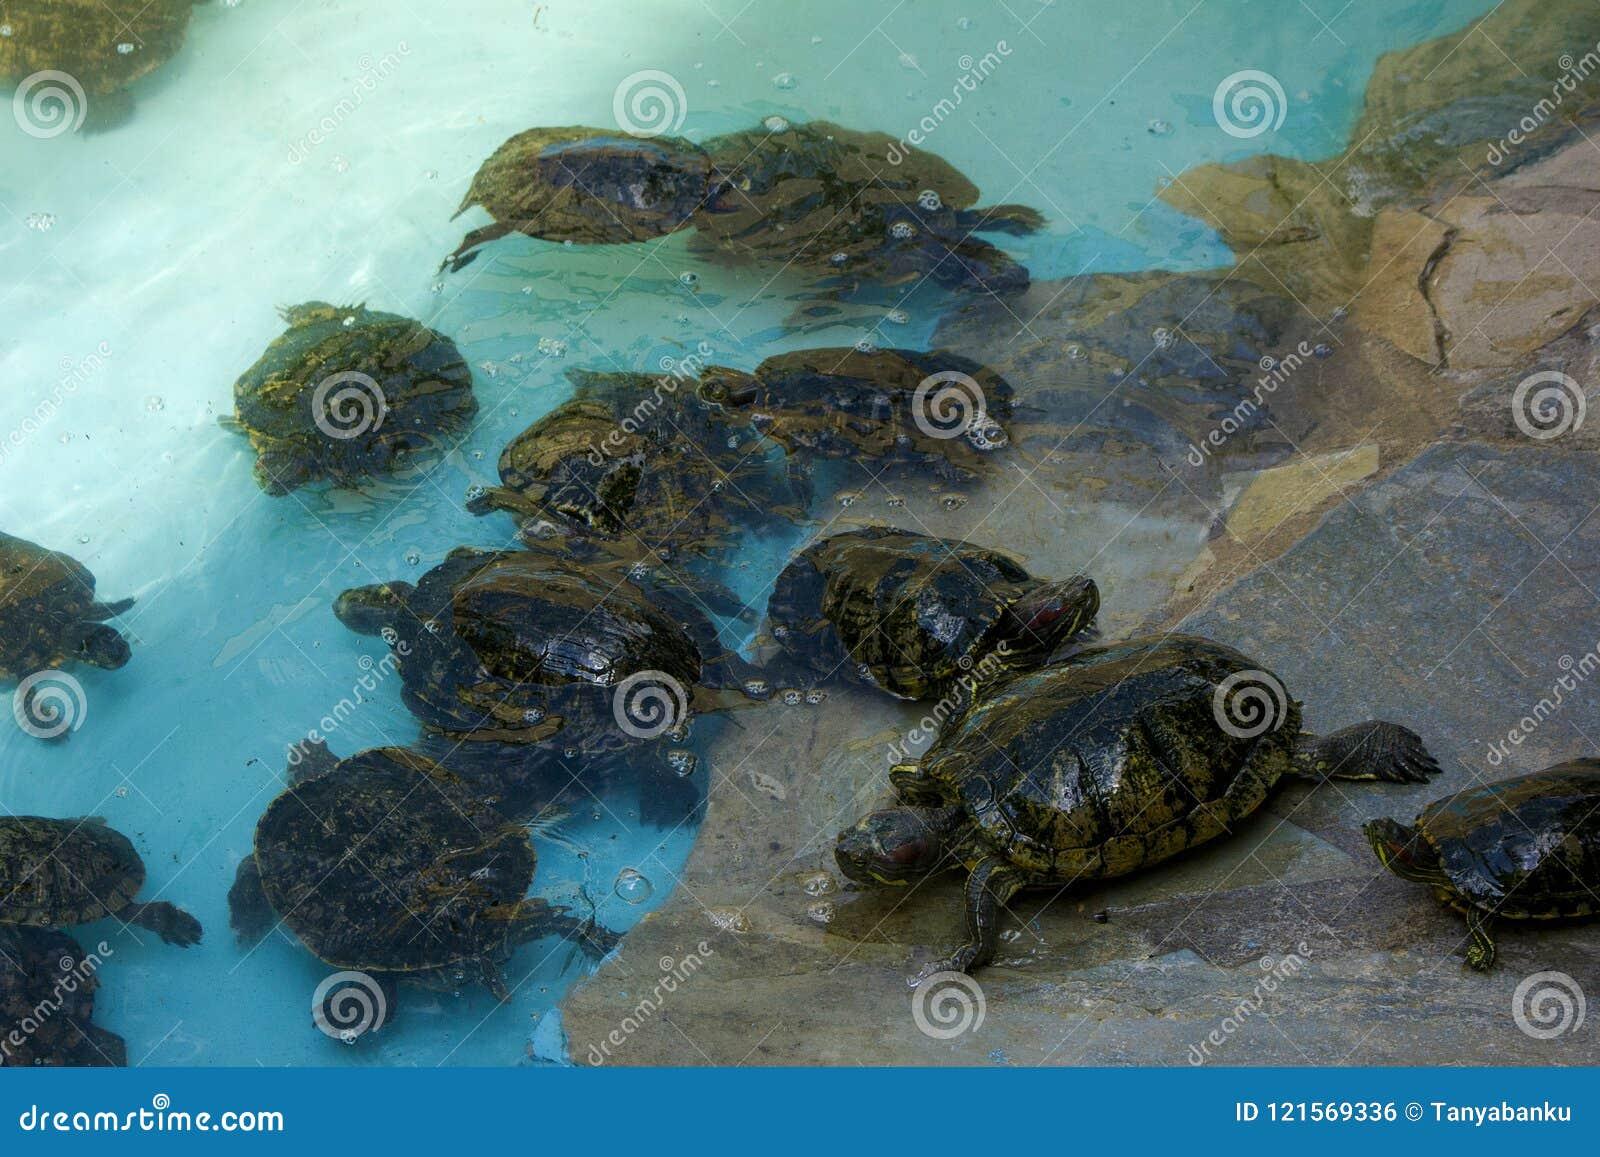 Closeup photo of small turtles